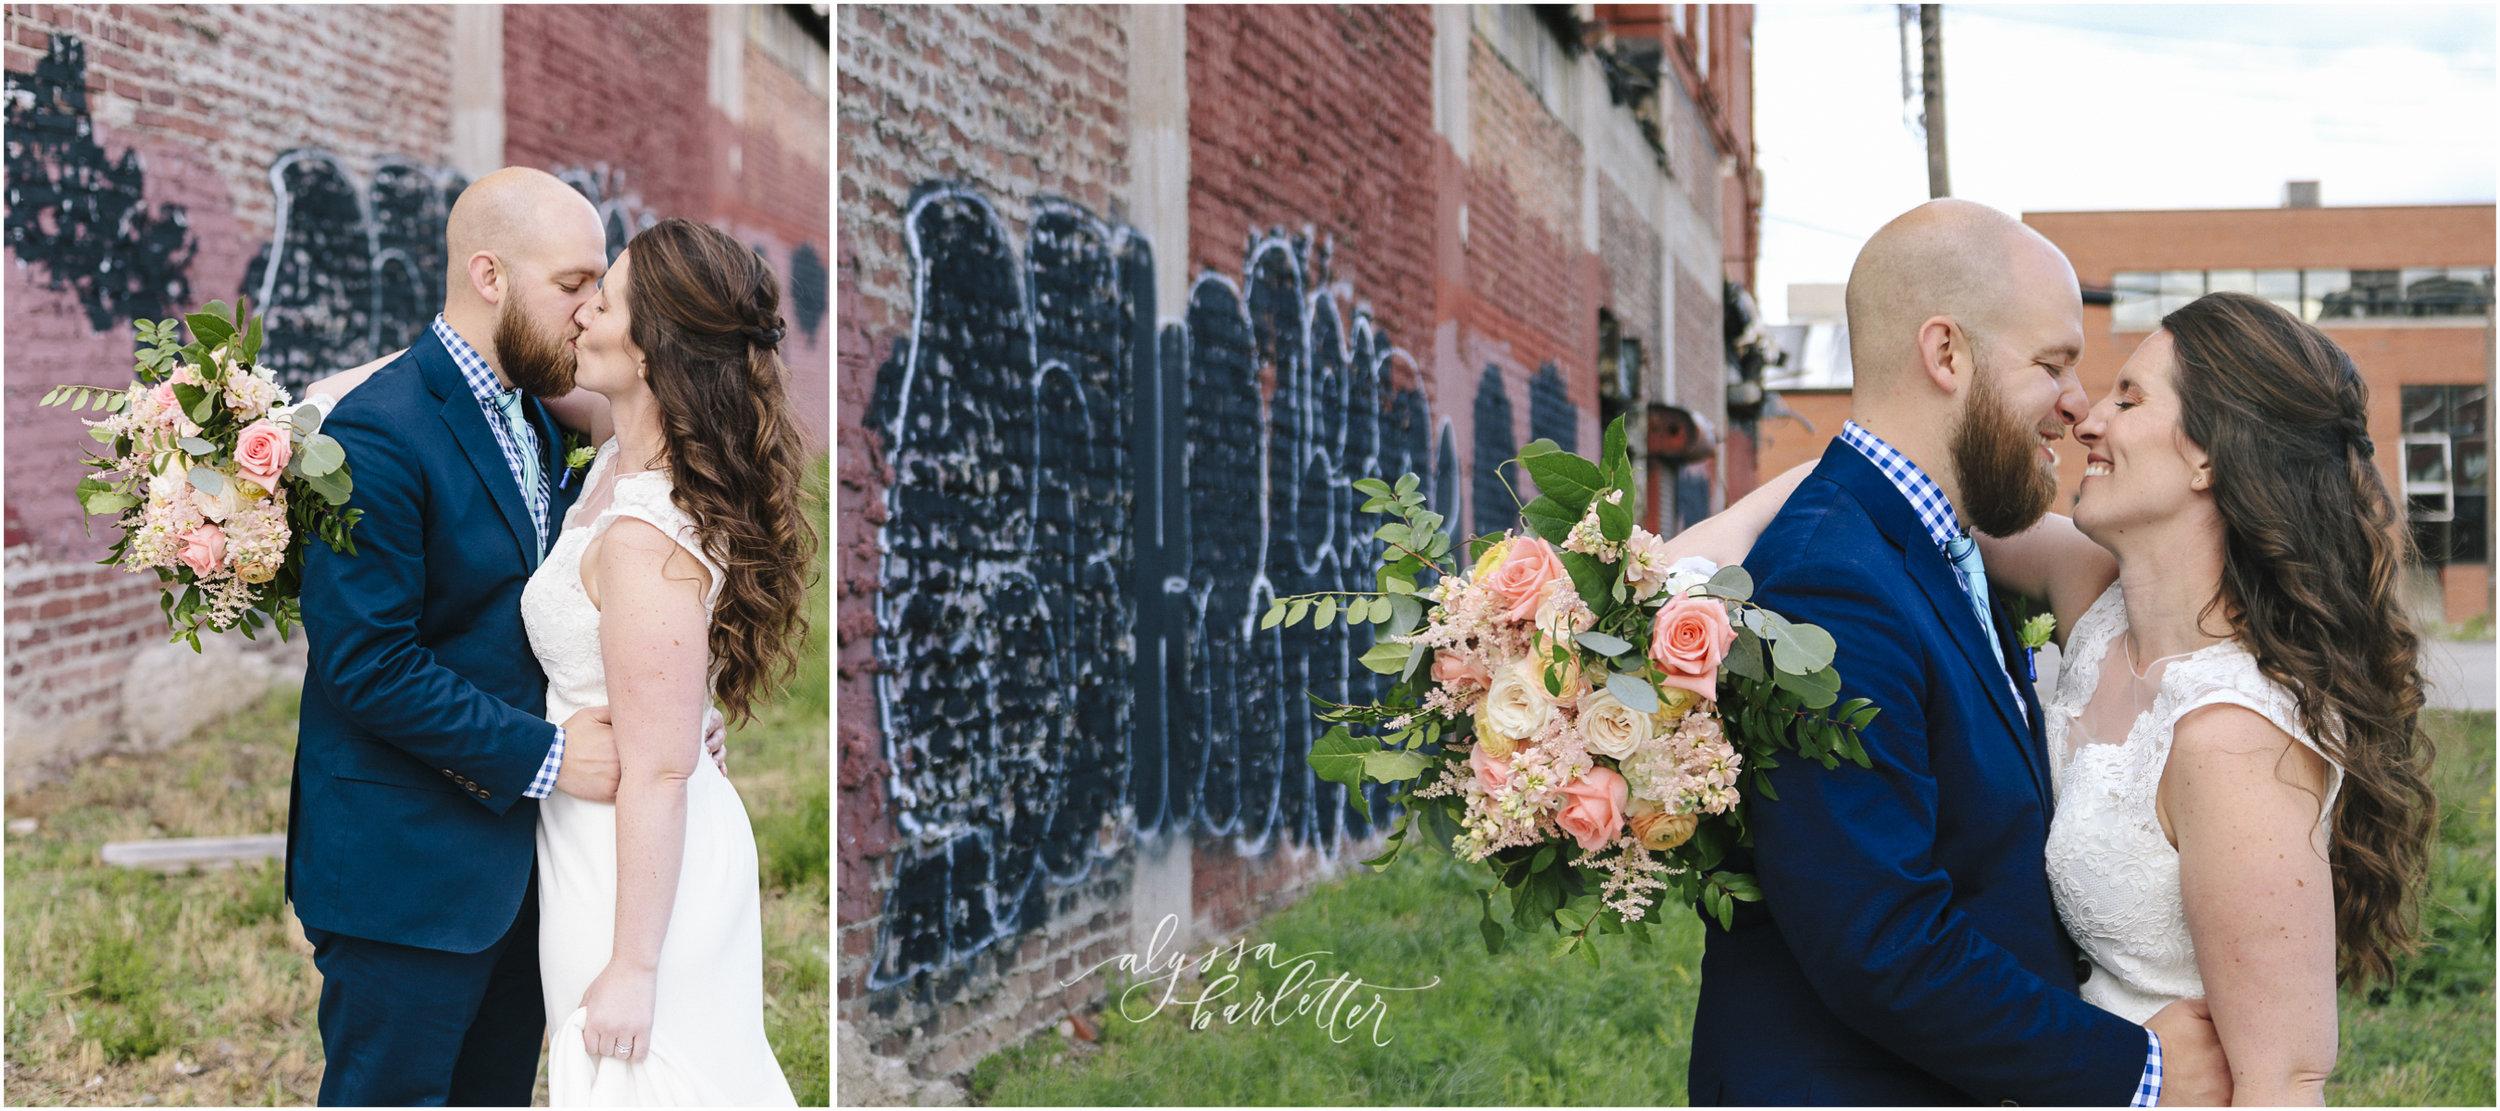 alyssa barletter photography kansas city wedding 2016 main courtney and brian-1-34.jpg